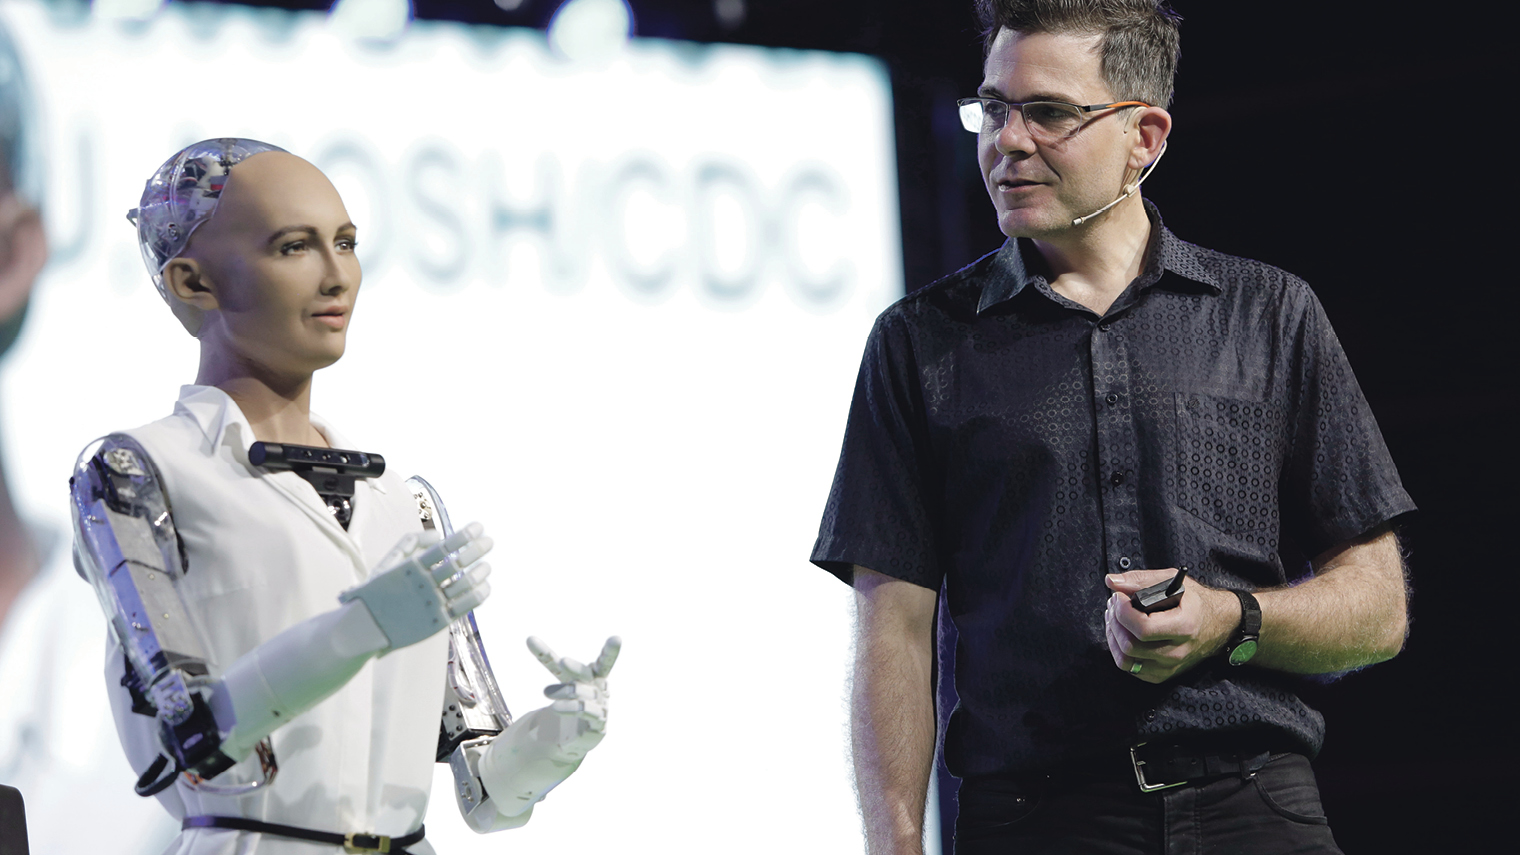 David Hanson with his Sophia robot